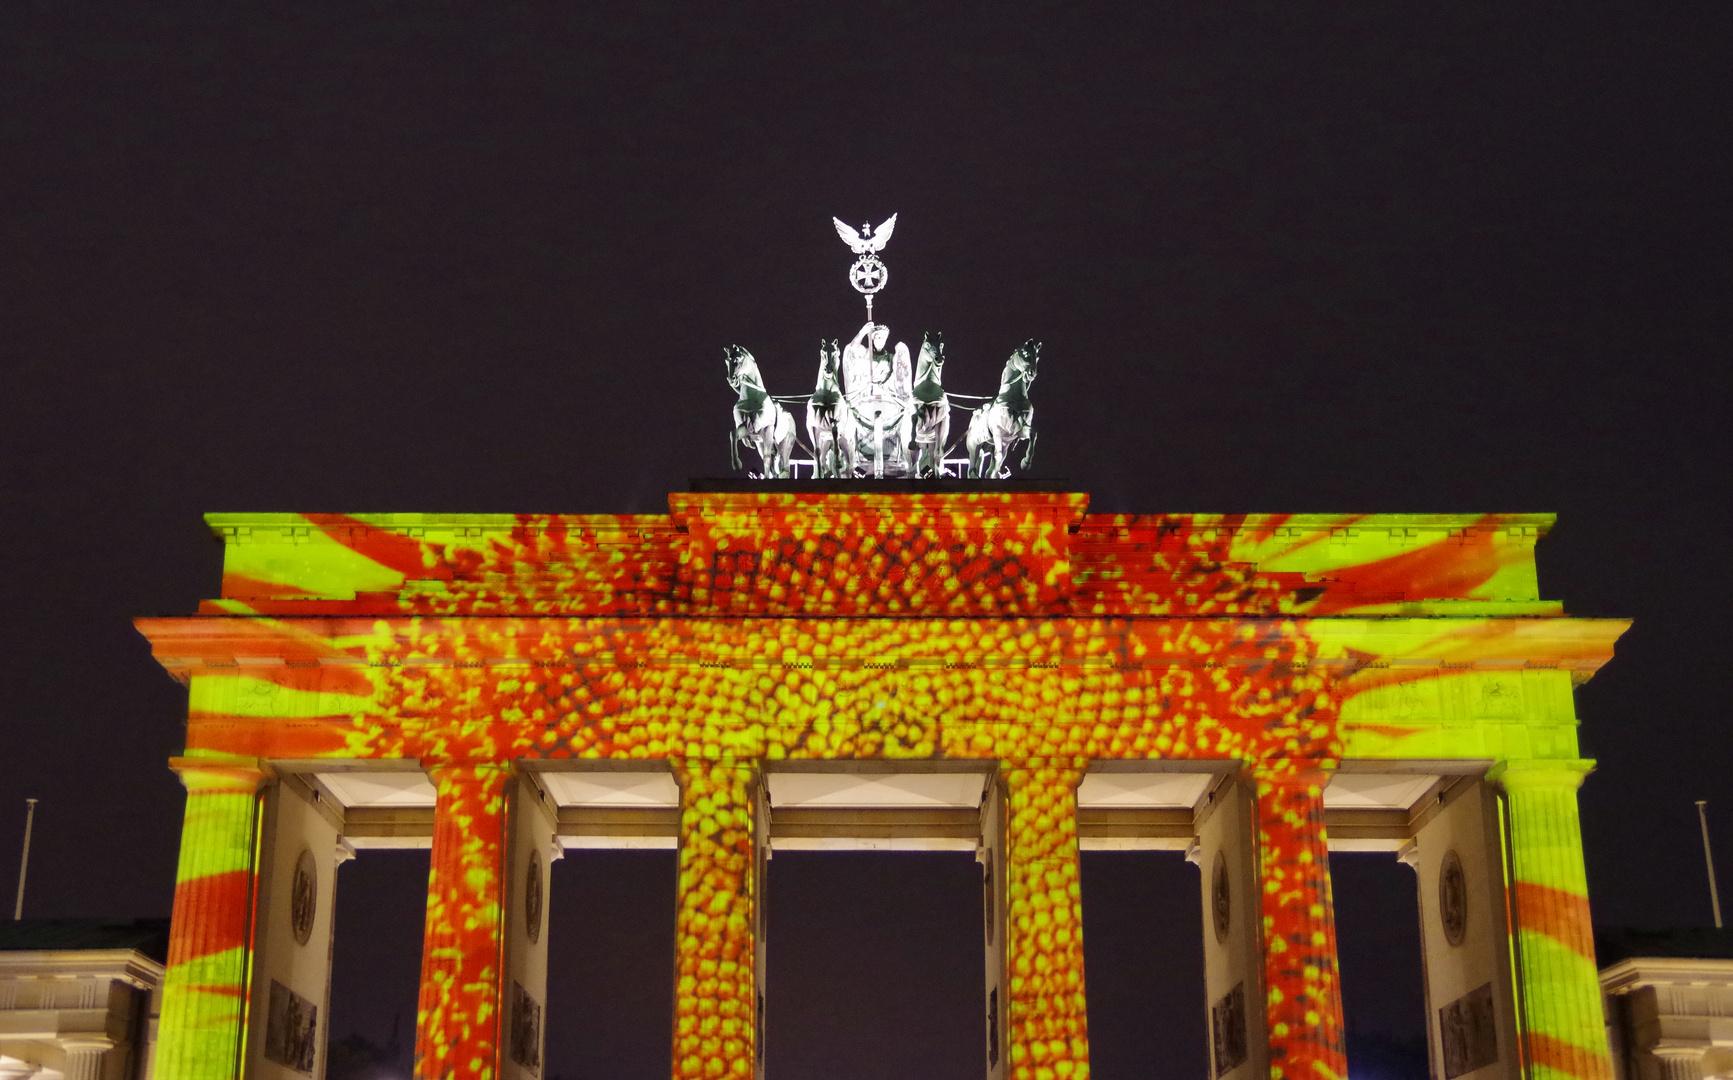 Art of Lights - Berlin 2014 - Brandenburger Tor - 2